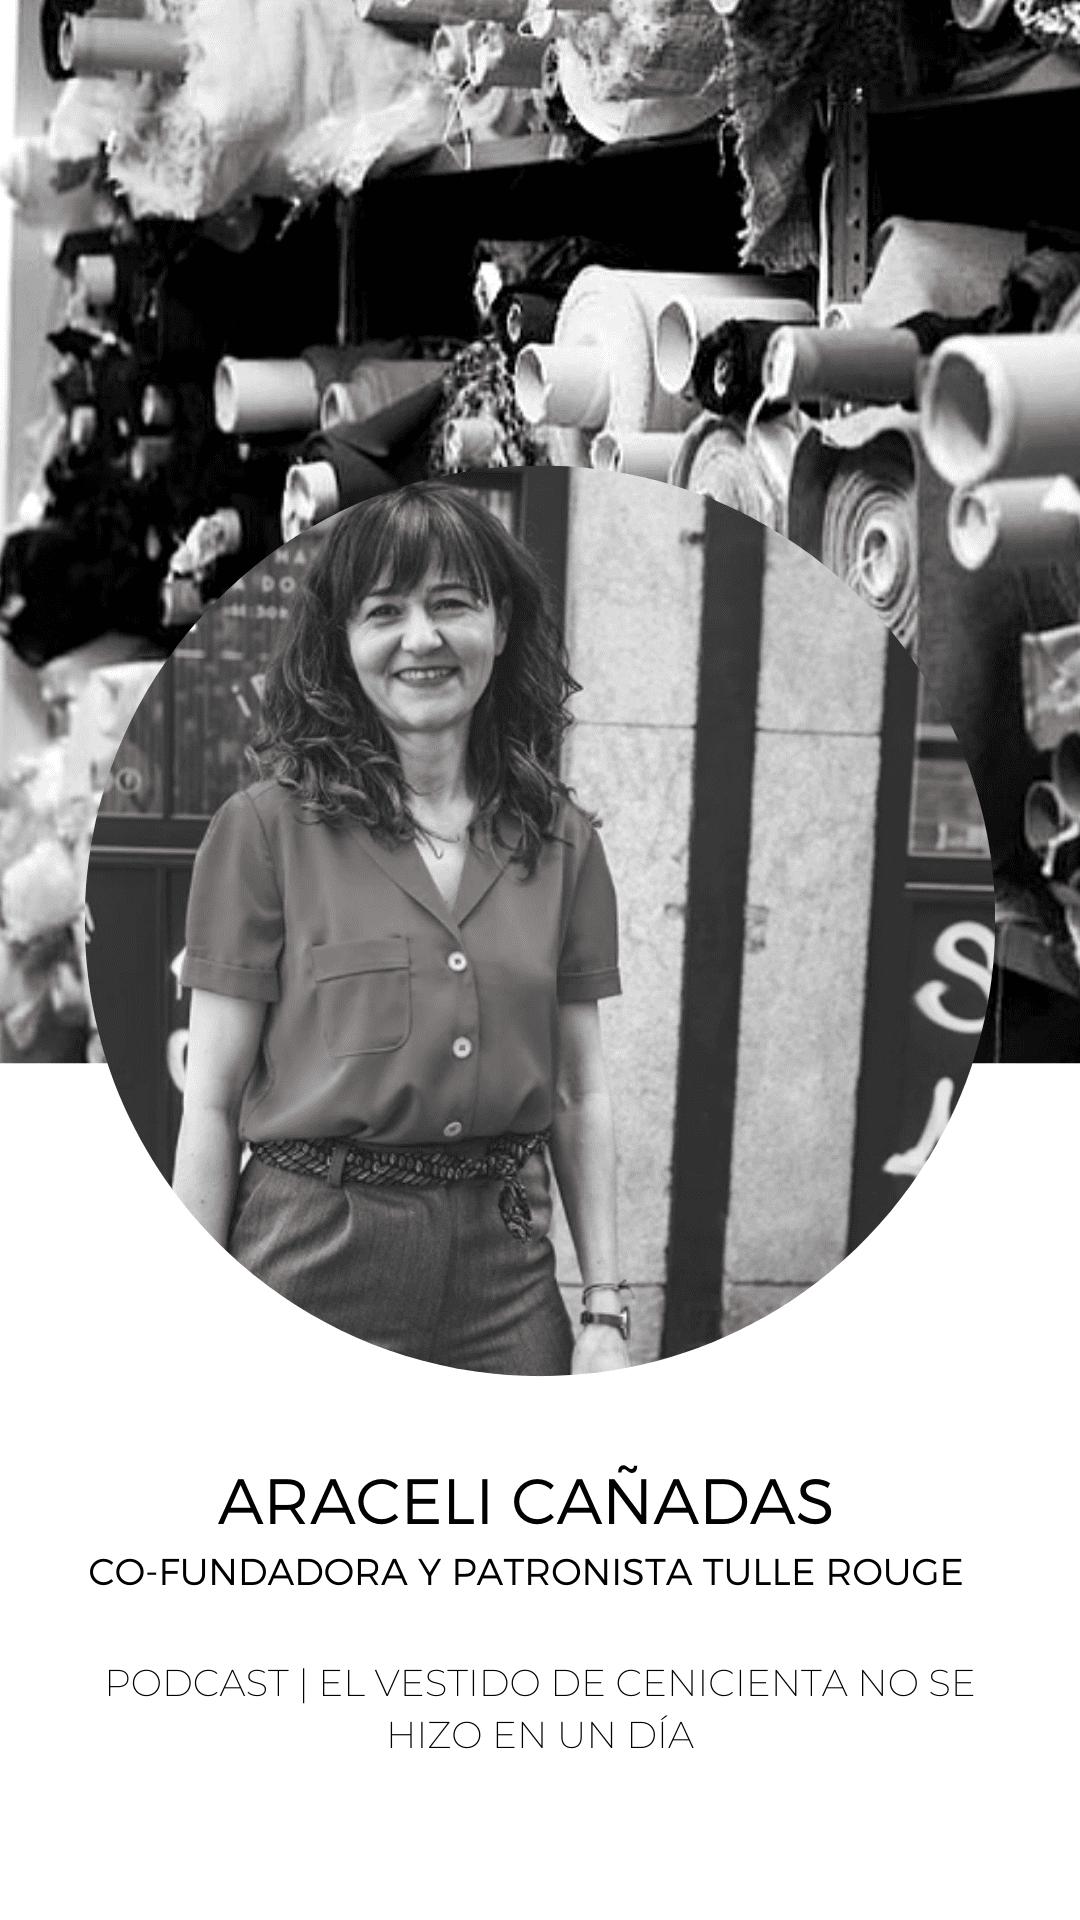 Araceli_Canadas_Podcast